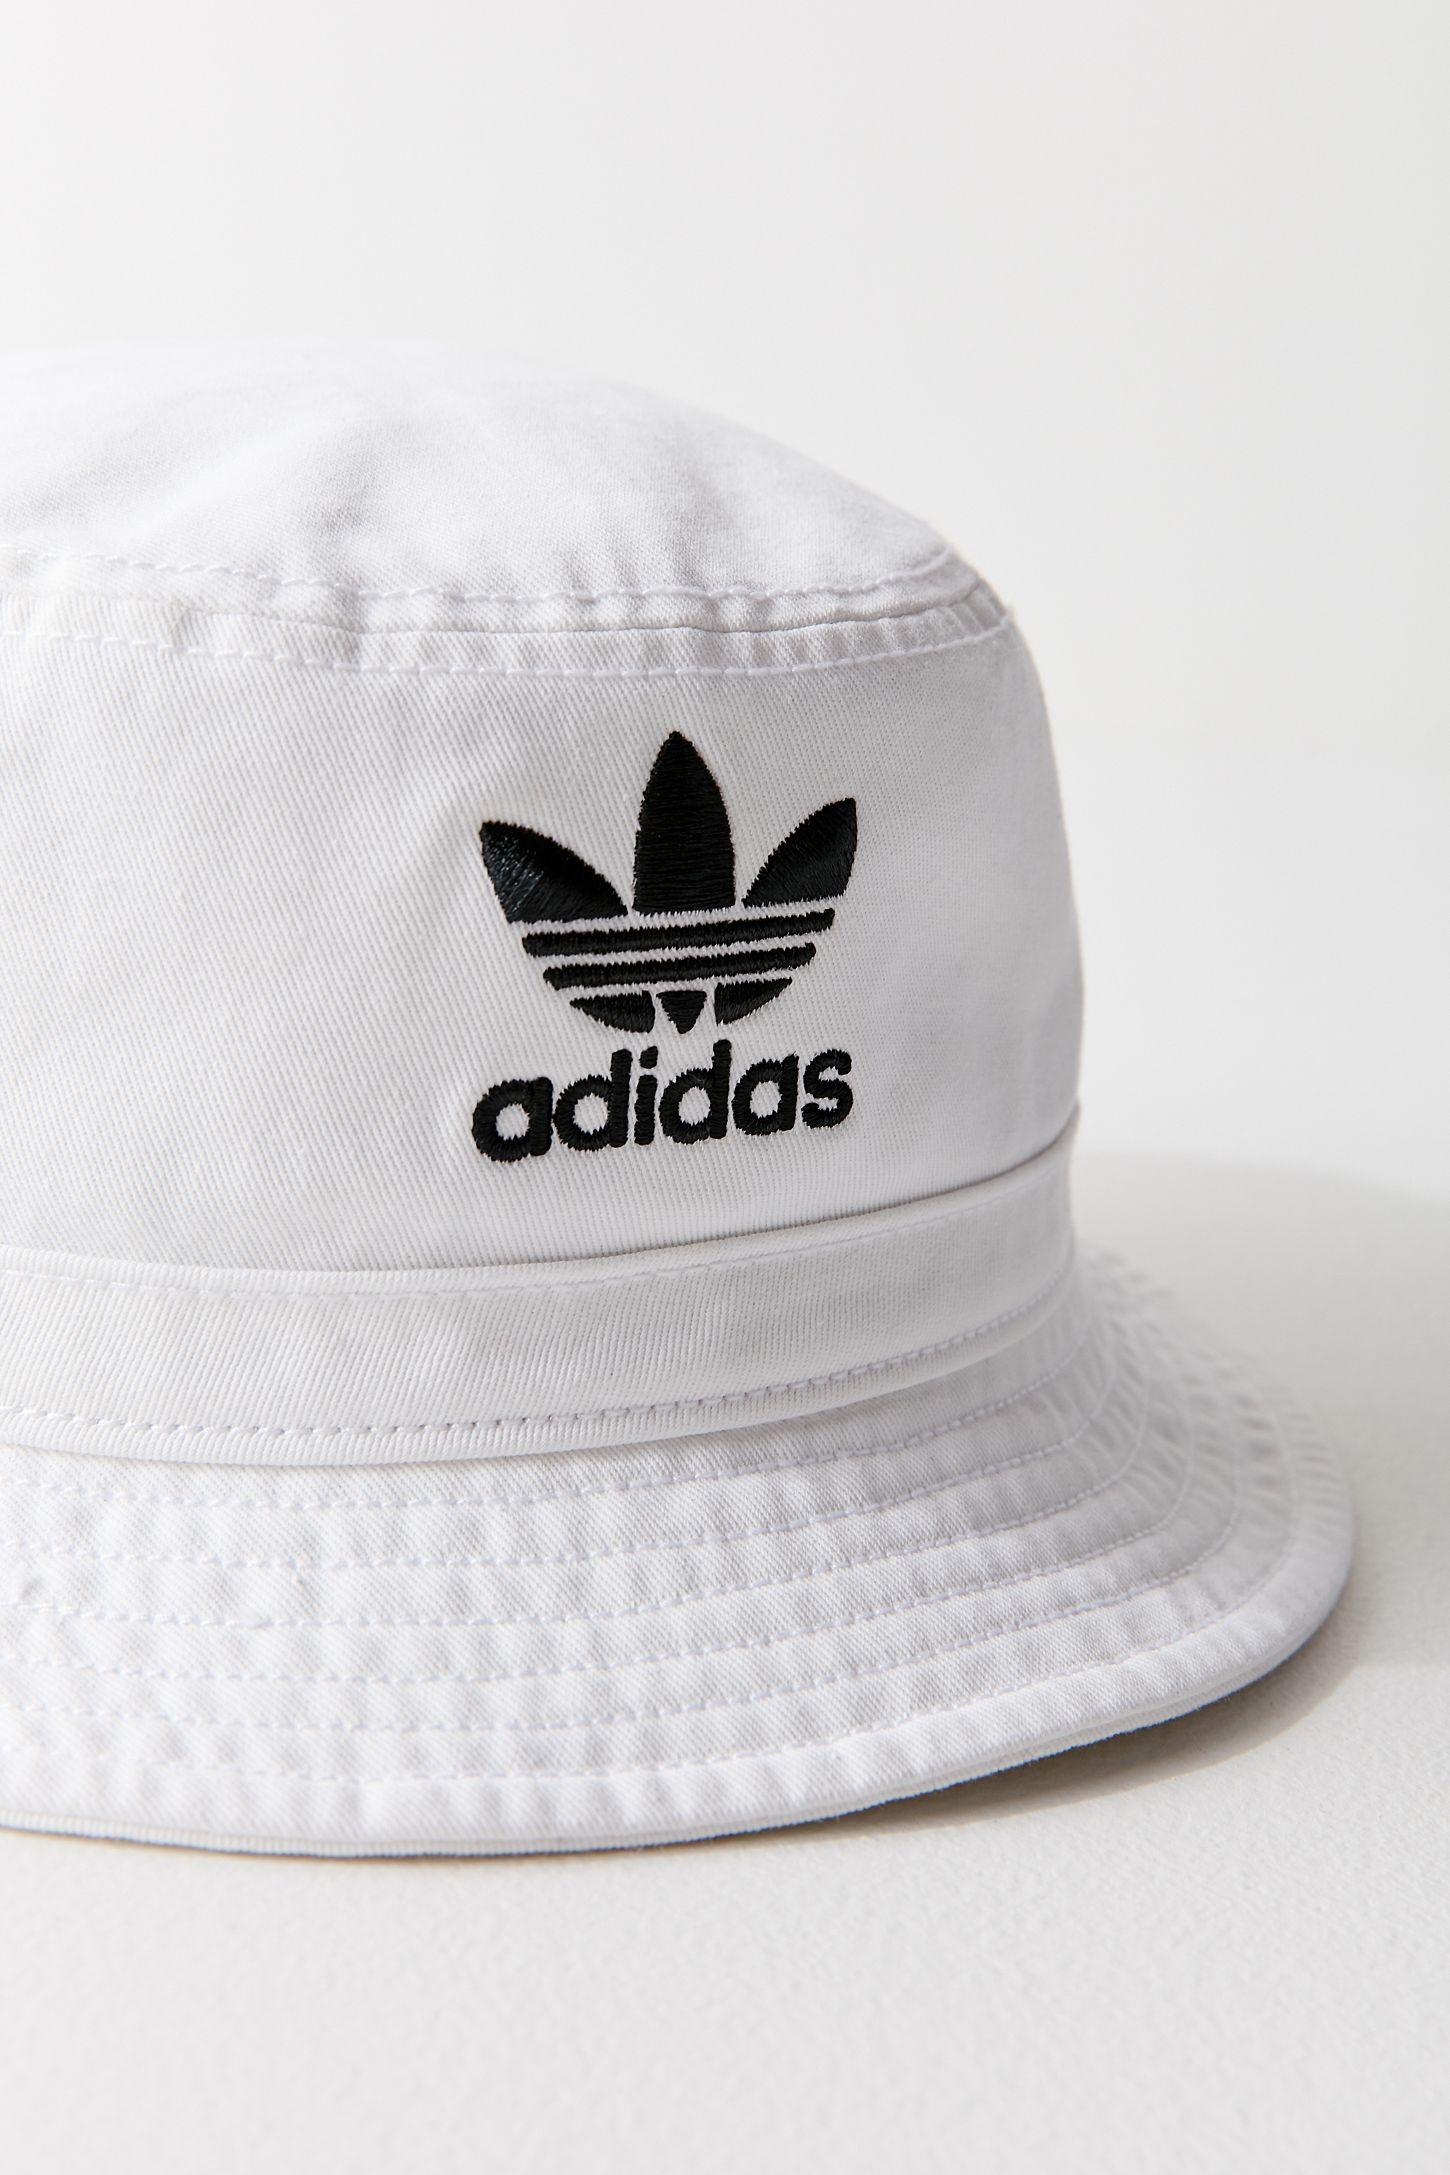 4b95af30 adidas Originals Denim Bucket Hat | Urban Outfitters